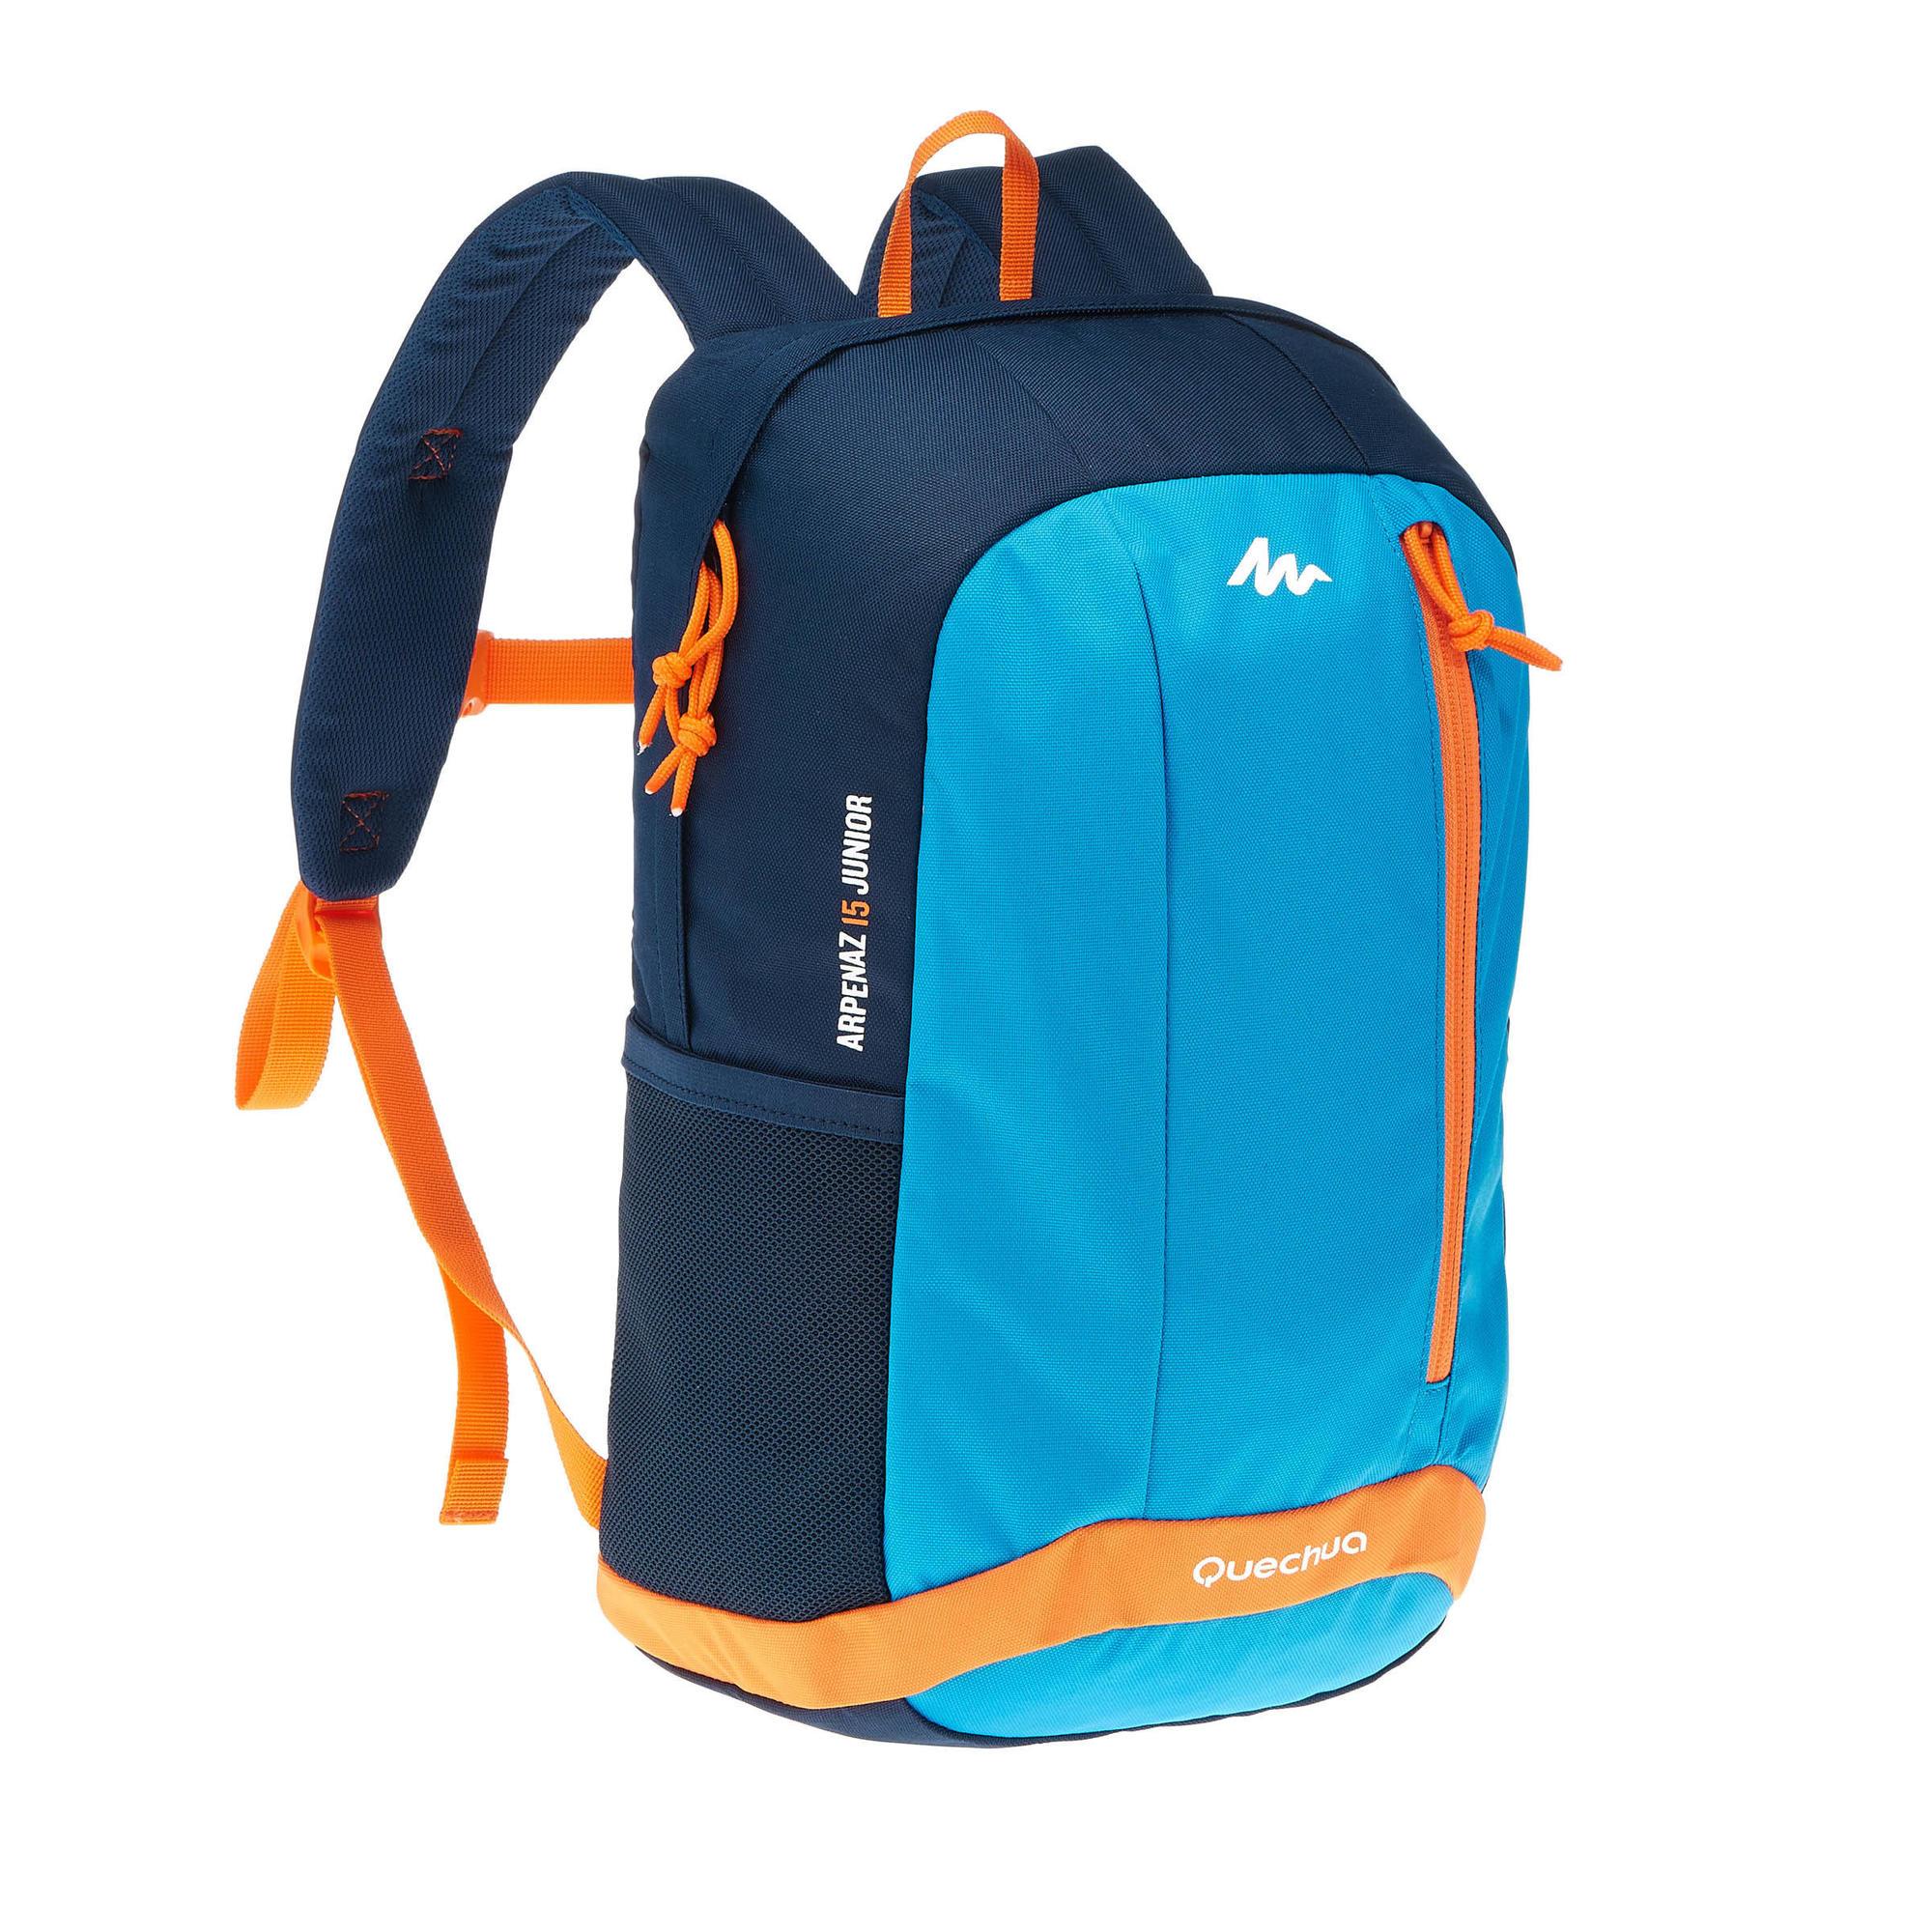 sac dos de randonn e enfant arpenaz 15 litres junior bleu quechua. Black Bedroom Furniture Sets. Home Design Ideas